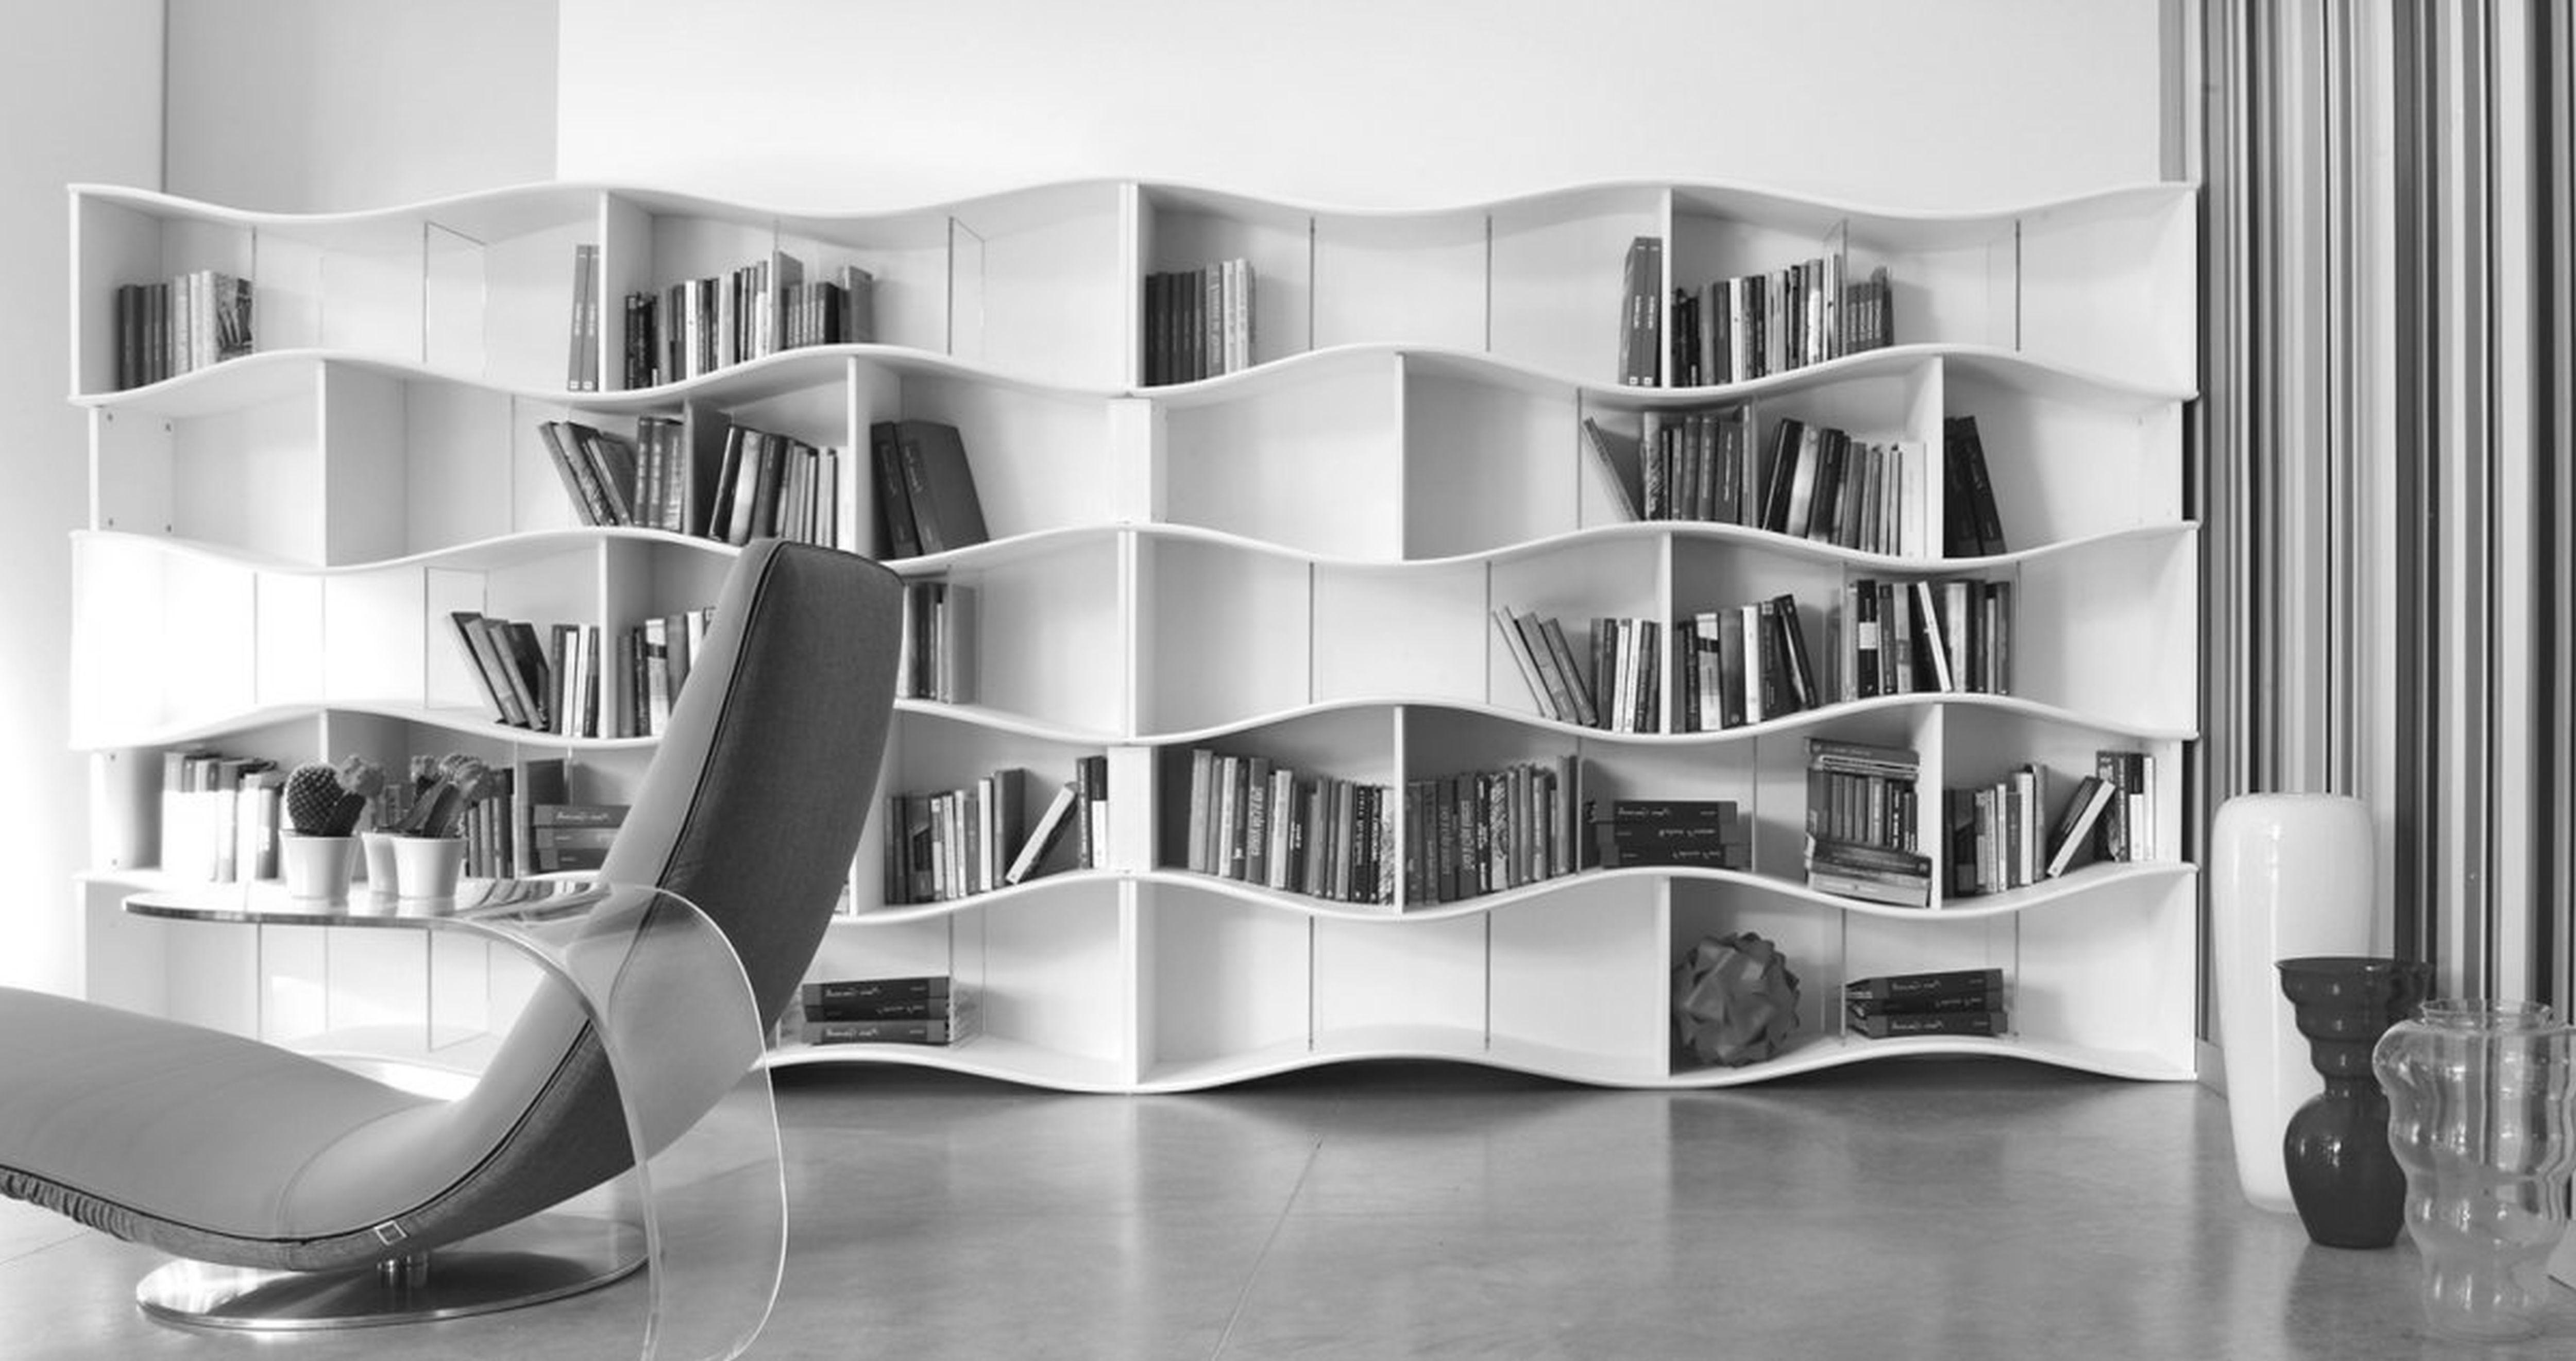 australia for bookcase images bookshelves fresh plus bookcases library furniture unique cool